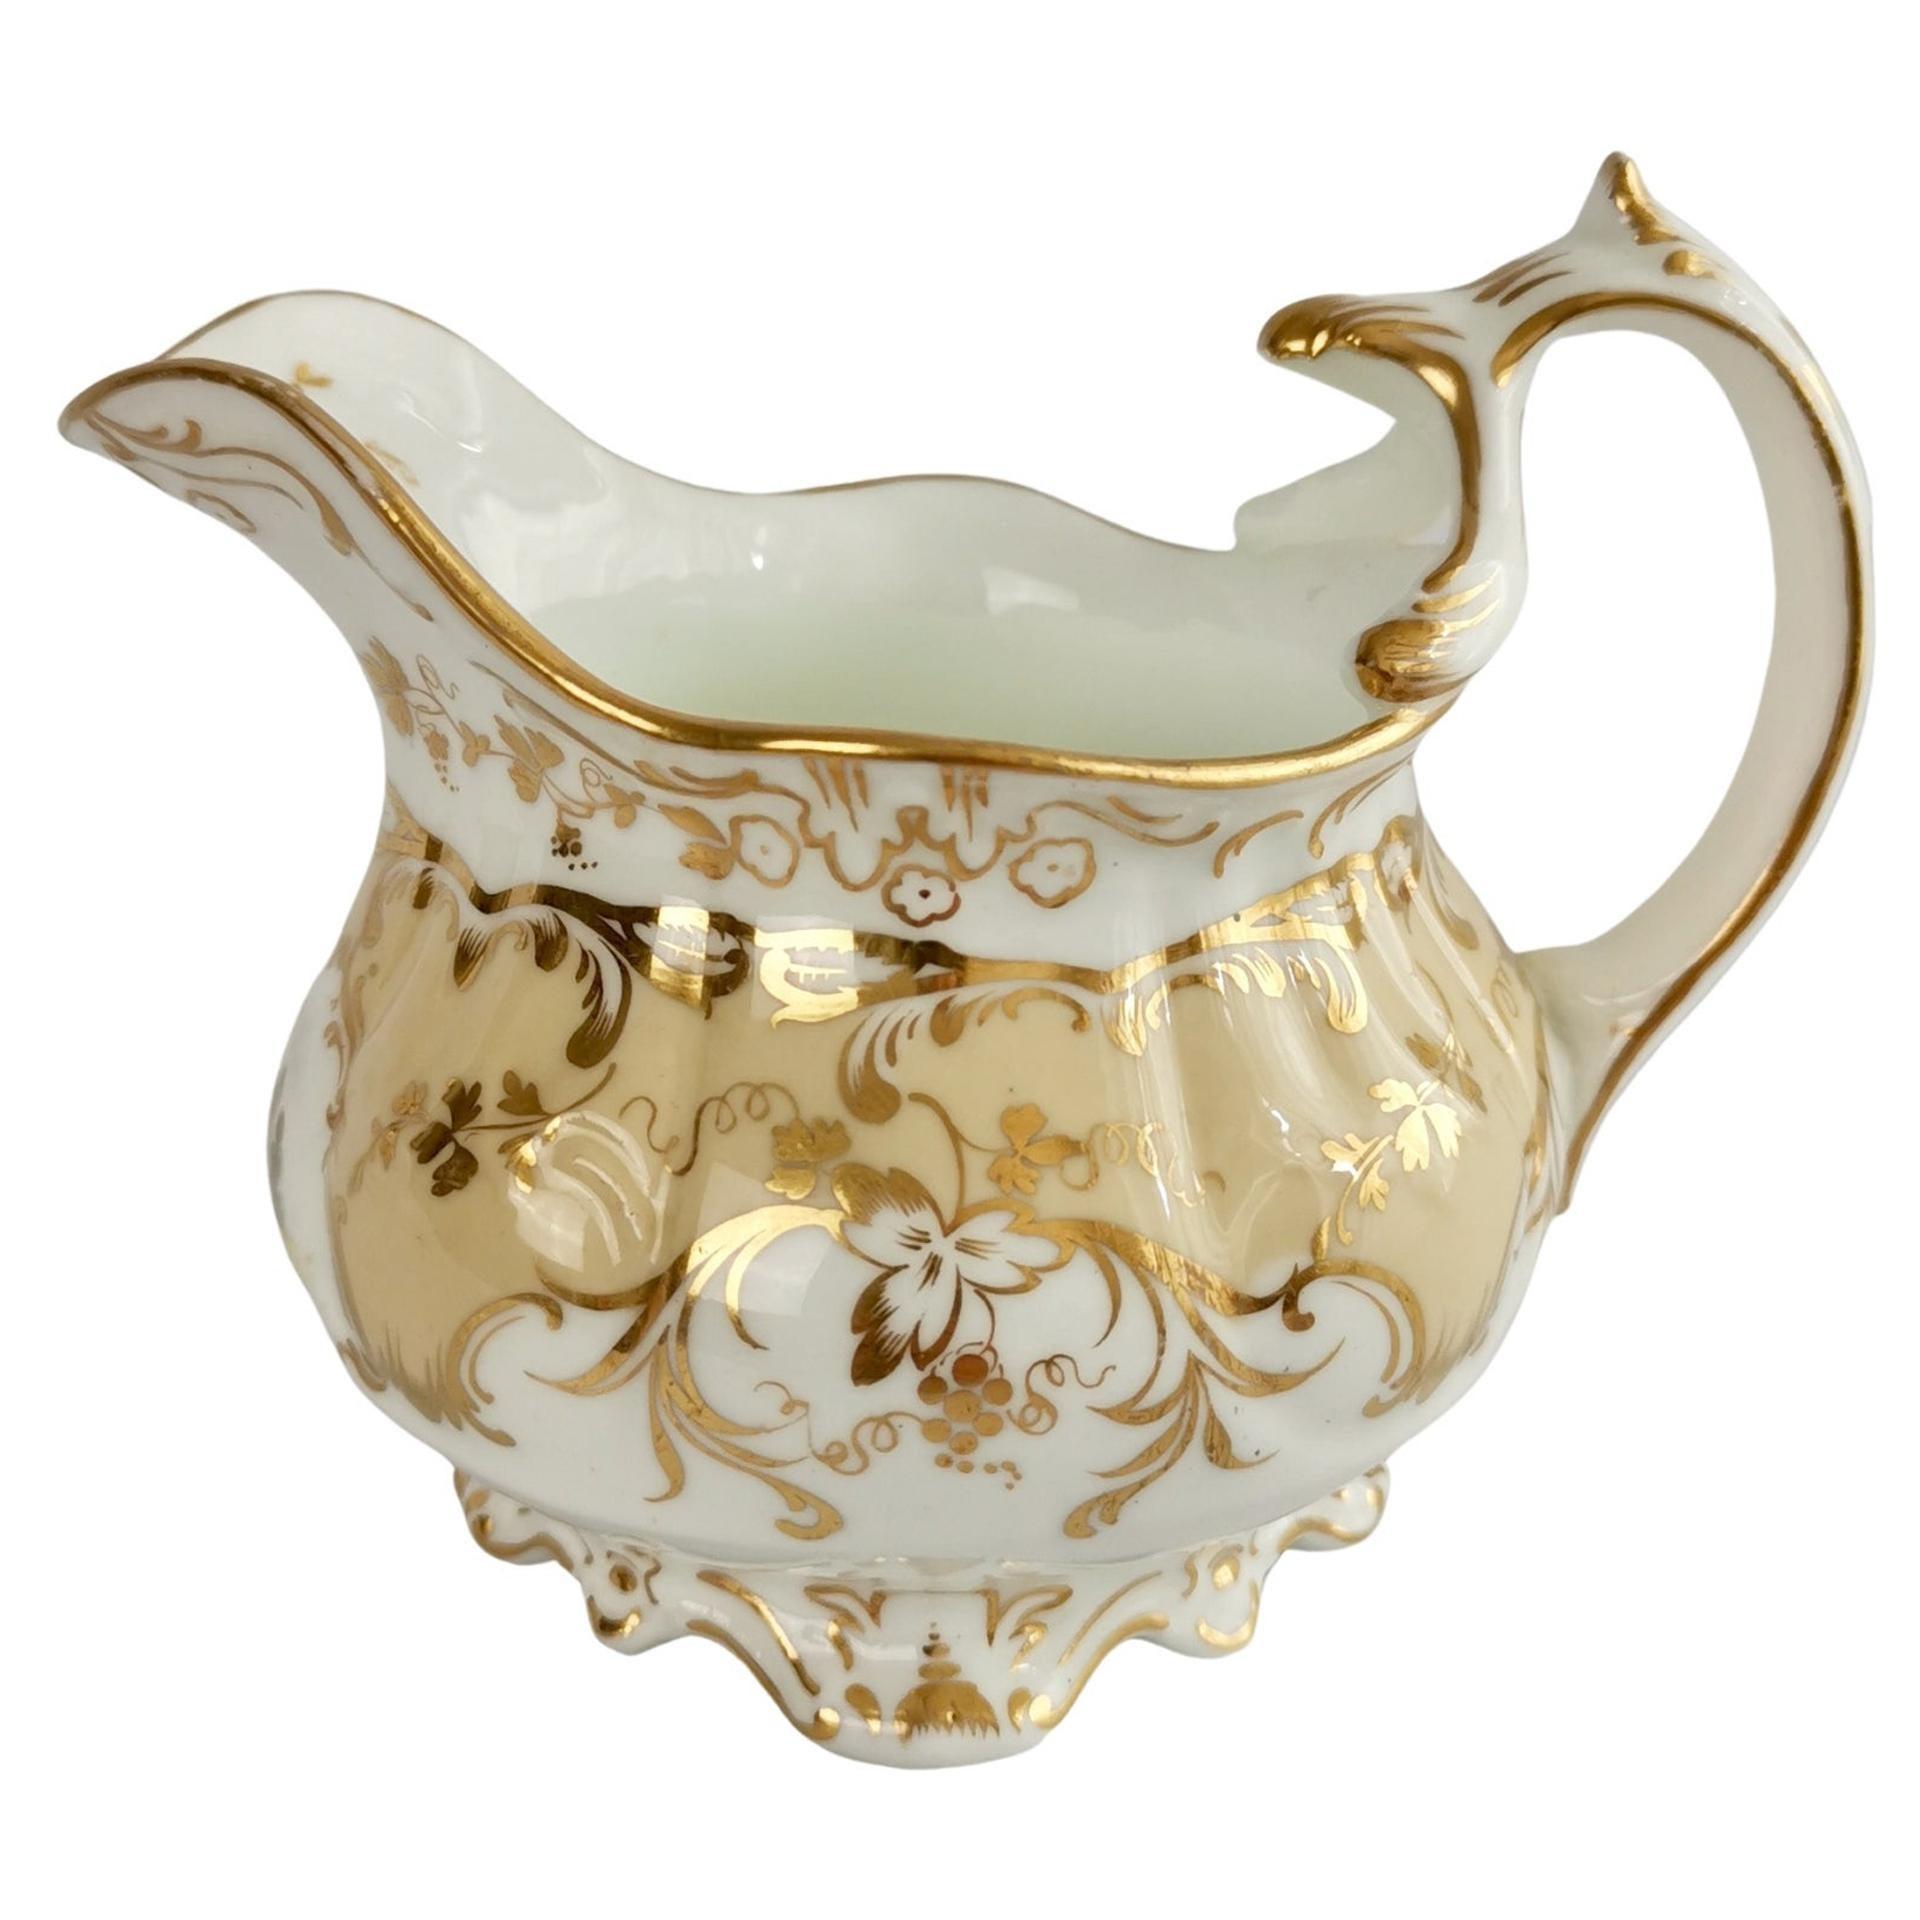 Coalport Porcelain Creamer, Beige with Landscapes, Rococo Revival, ca 1840